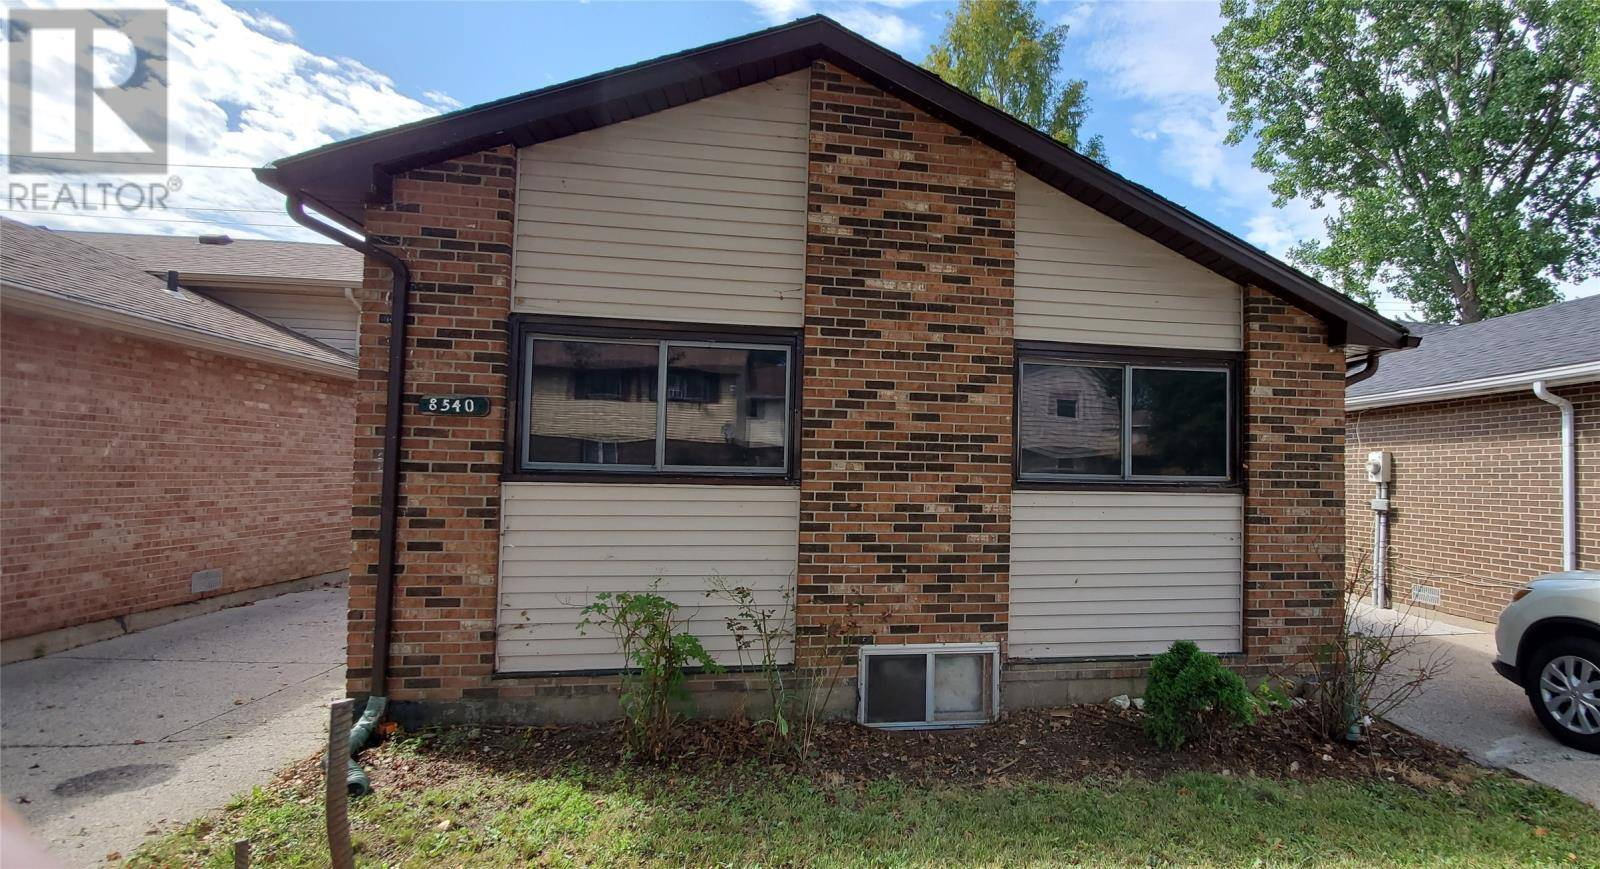 House for sale at 8540 Darlington  Windsor Ontario - MLS: 19024137